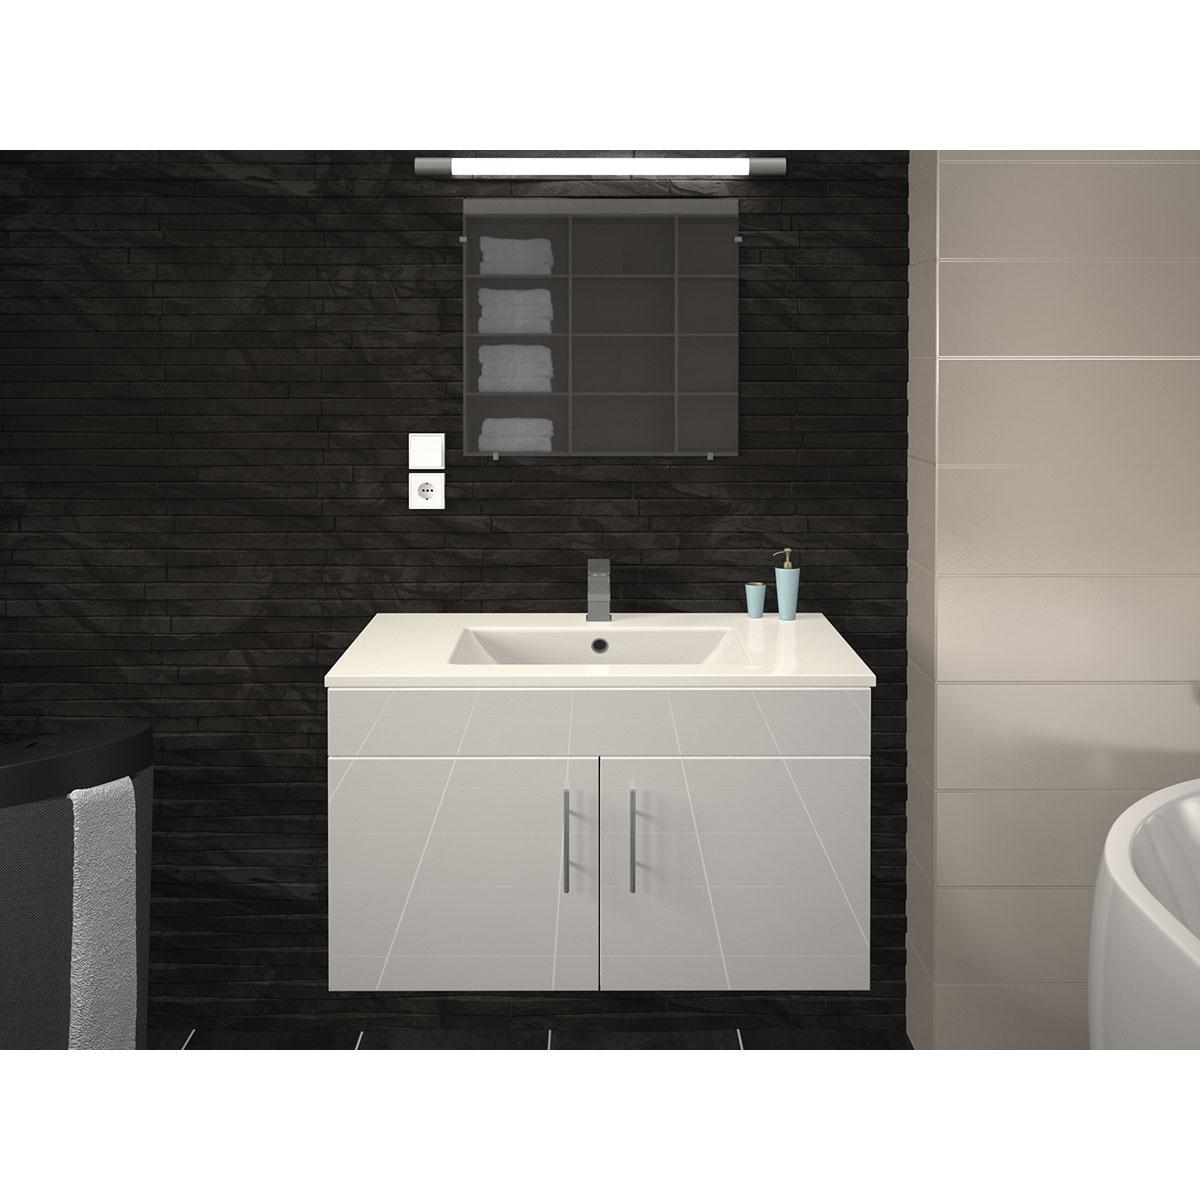 Vasque et meuble de salle de bain en 80 cm  (Blanc)